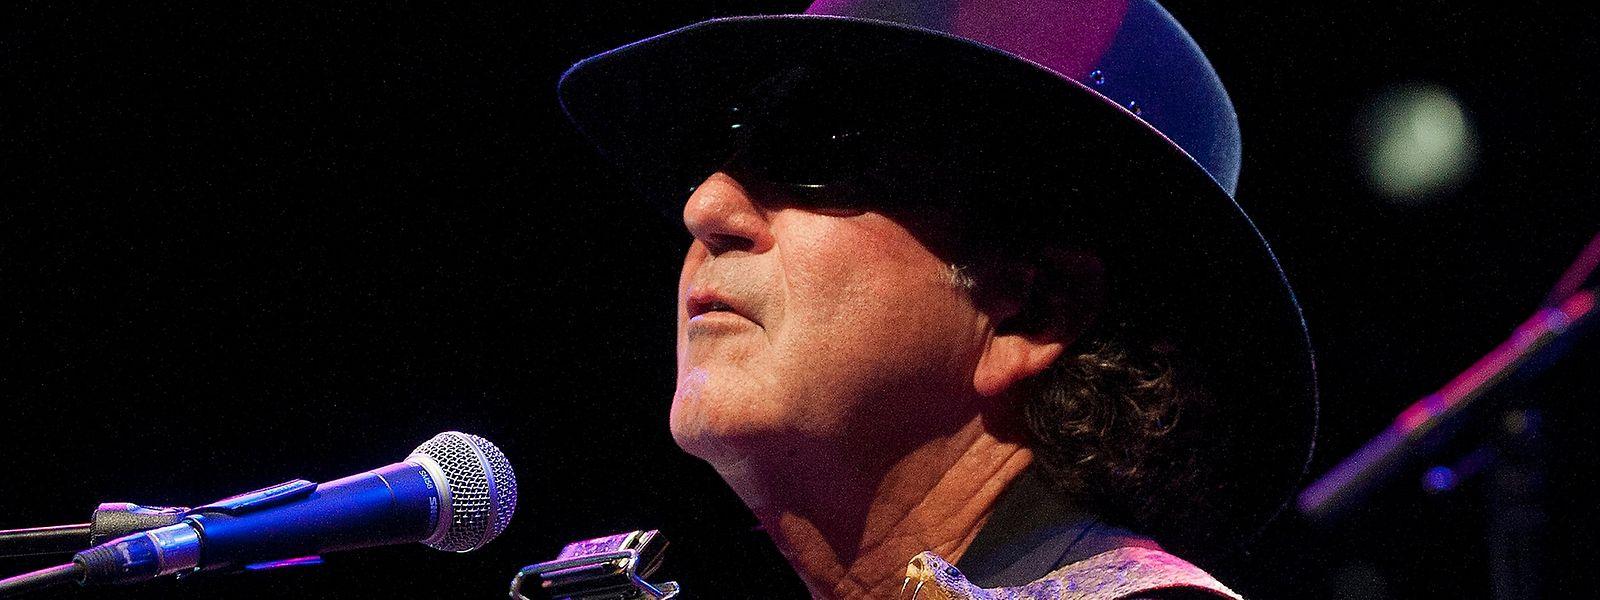 Mann aus den Sümpfen: Tony Joe White auf dem Montreux Jazz Festival 2013.